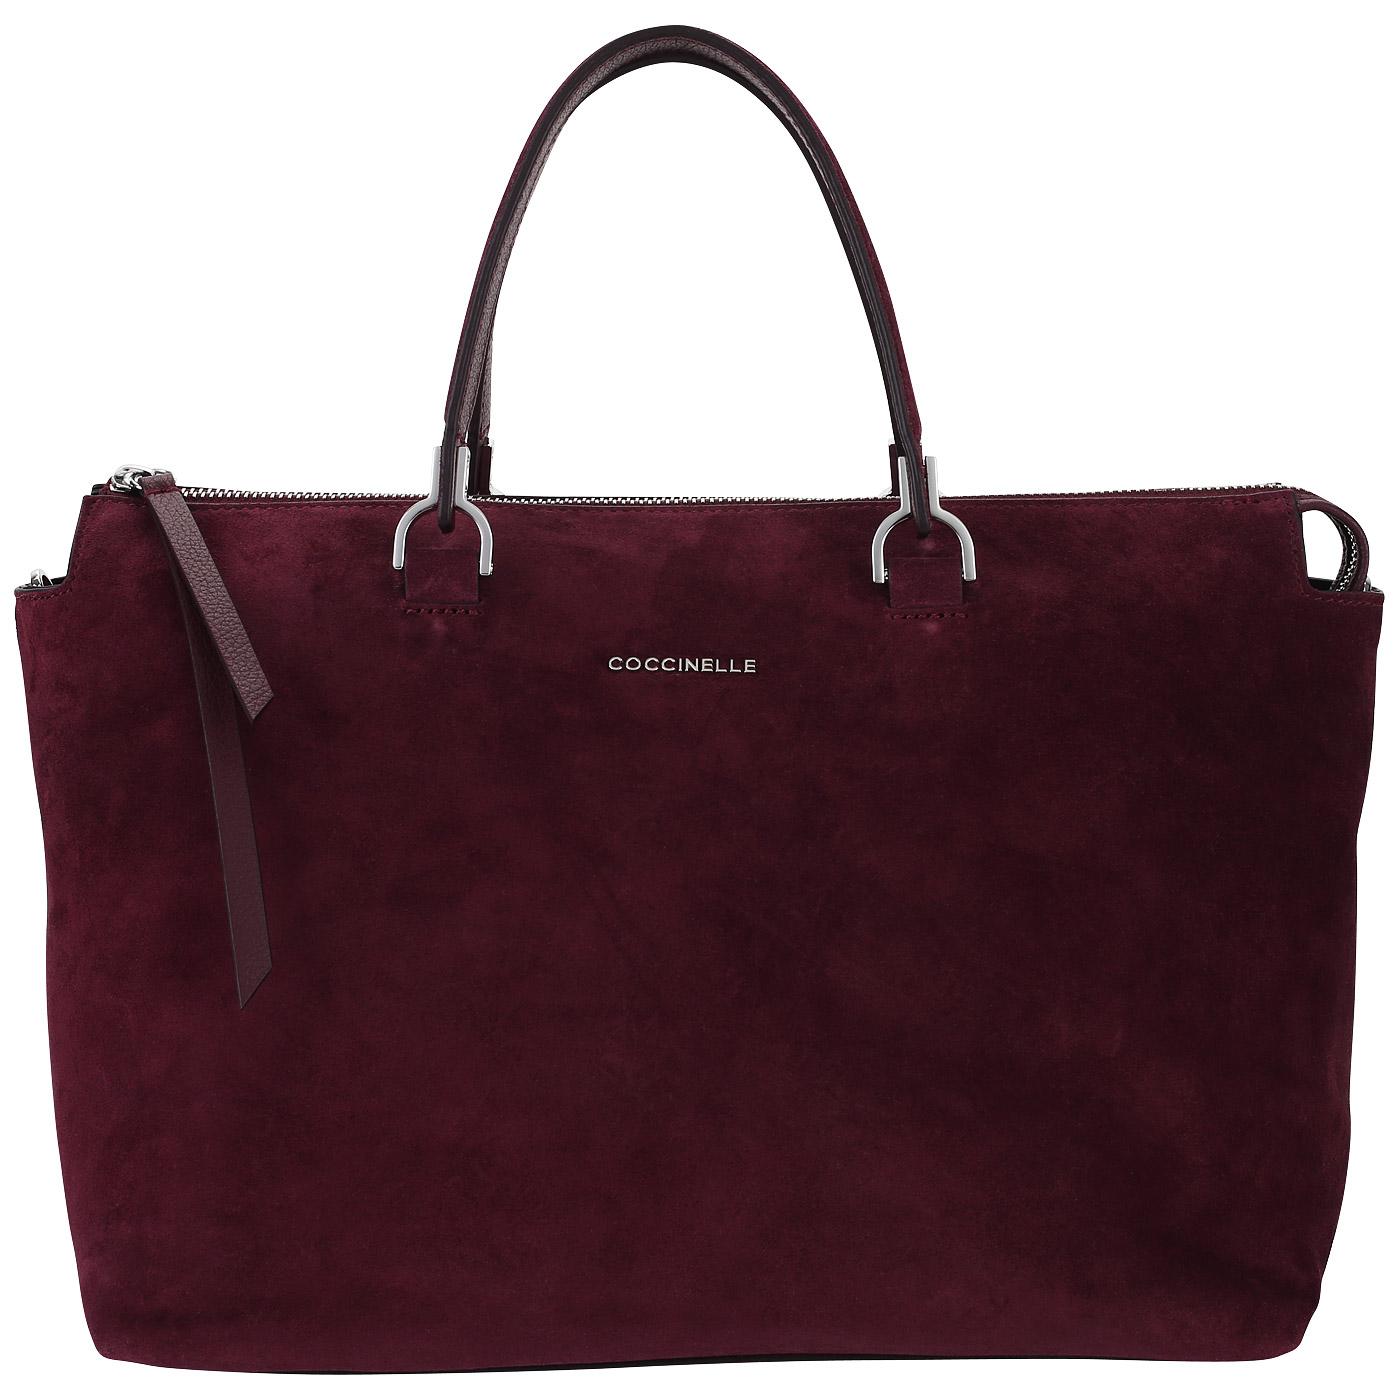 783d185cc9dd Вместительная сумка из замши Coccinelle Keyla suede Вместительная сумка из  замши Coccinelle Keyla suede ...